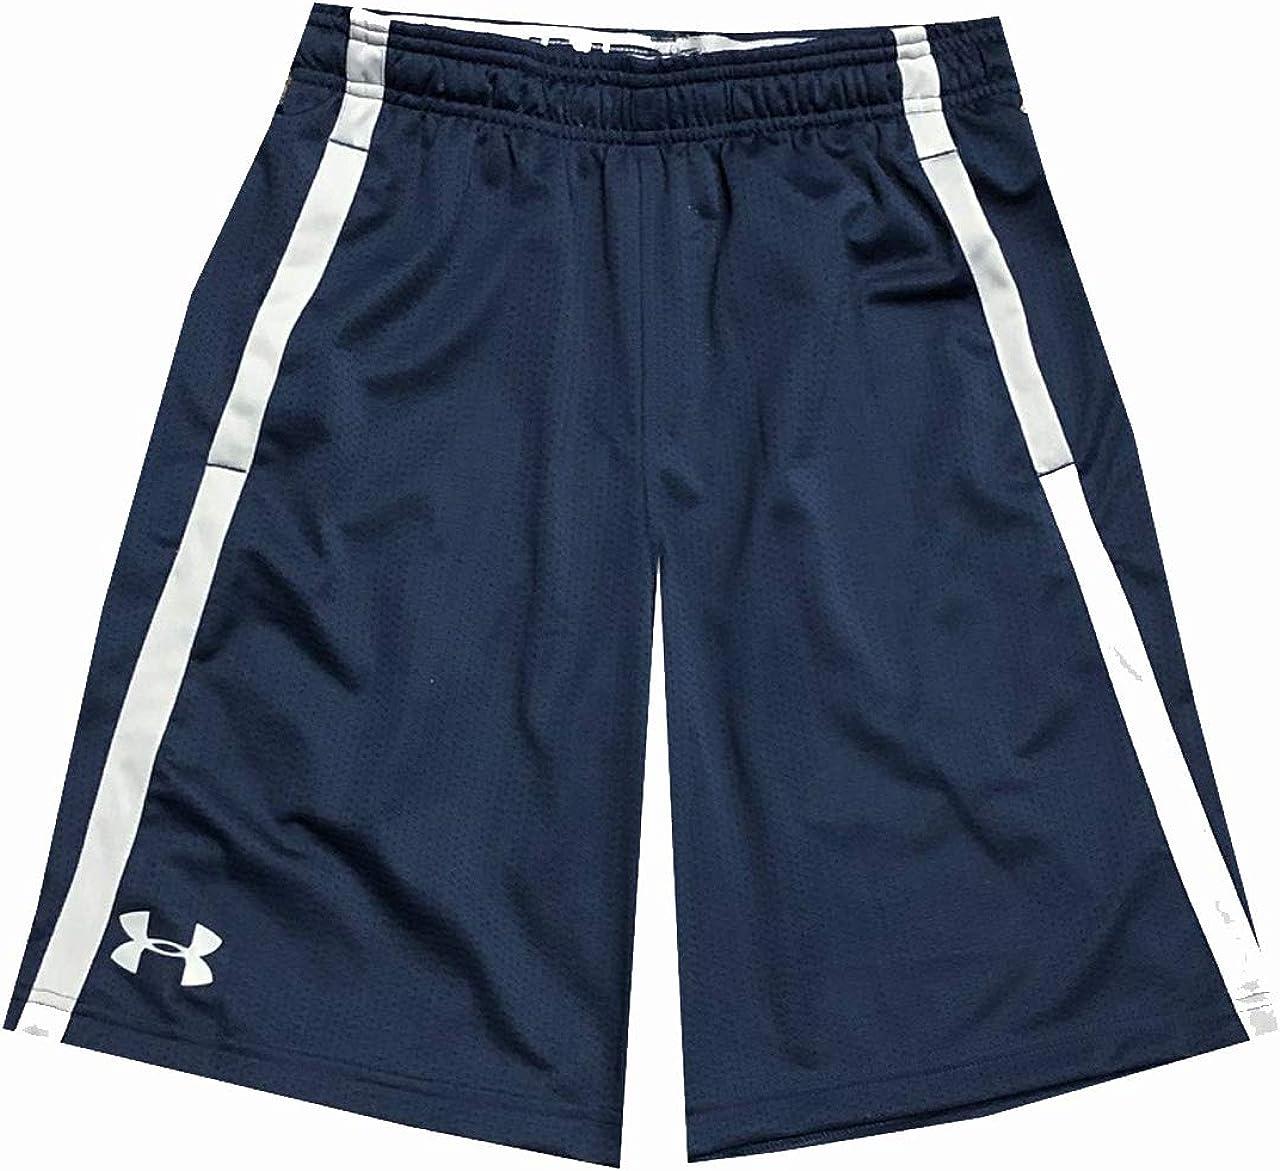 Under Armour Men's UA Tech Mail order Shorts Mesh S Athletic Minneapolis Mall HeatGear